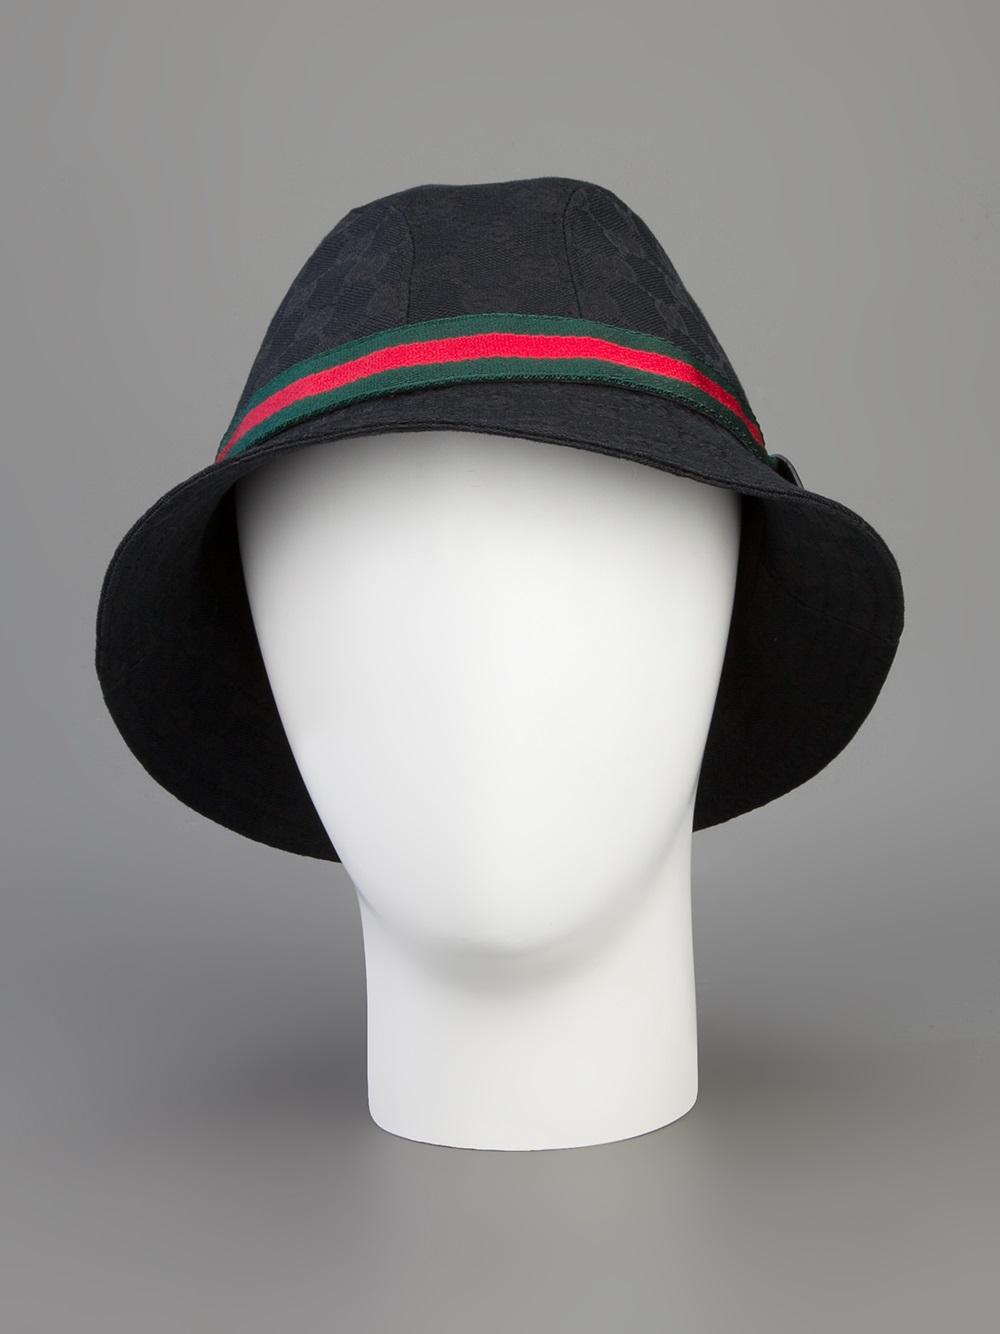 cb658a0b3a2 Lyst - Gucci Logo Fedora in Black for Men